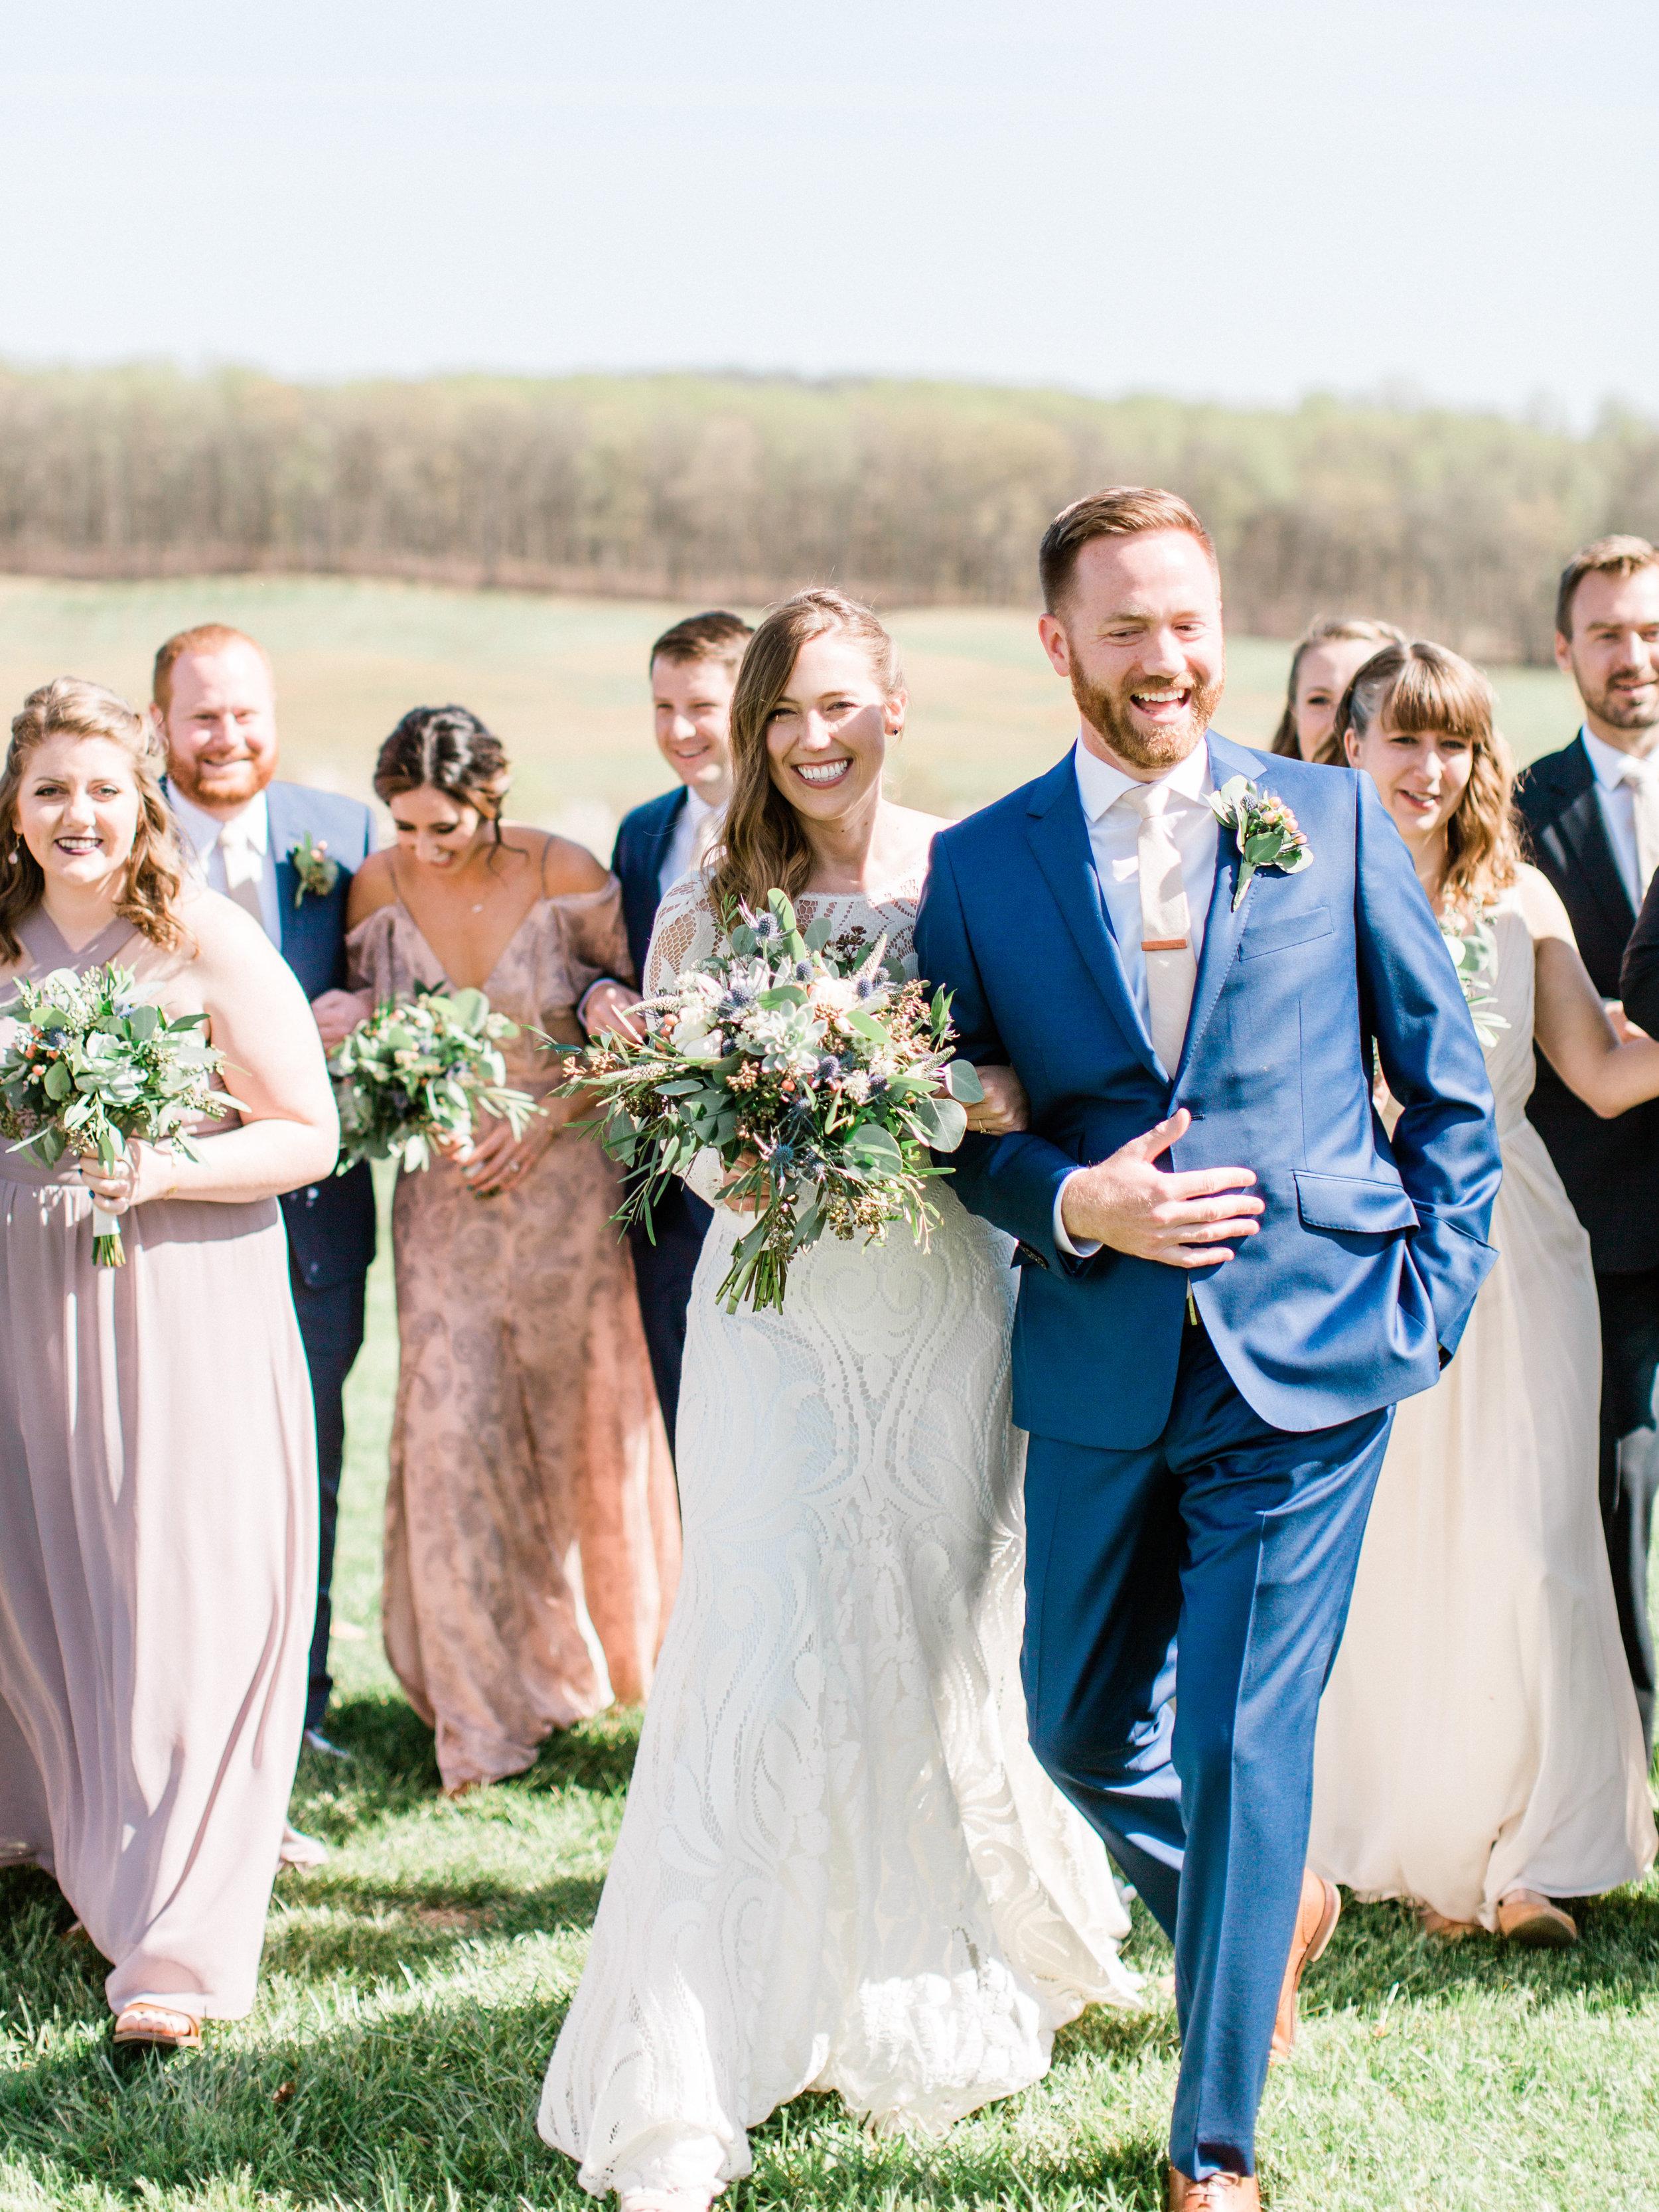 Market-Grelen-Somerset-Virginia-Wedding-Photographer-65.jpg